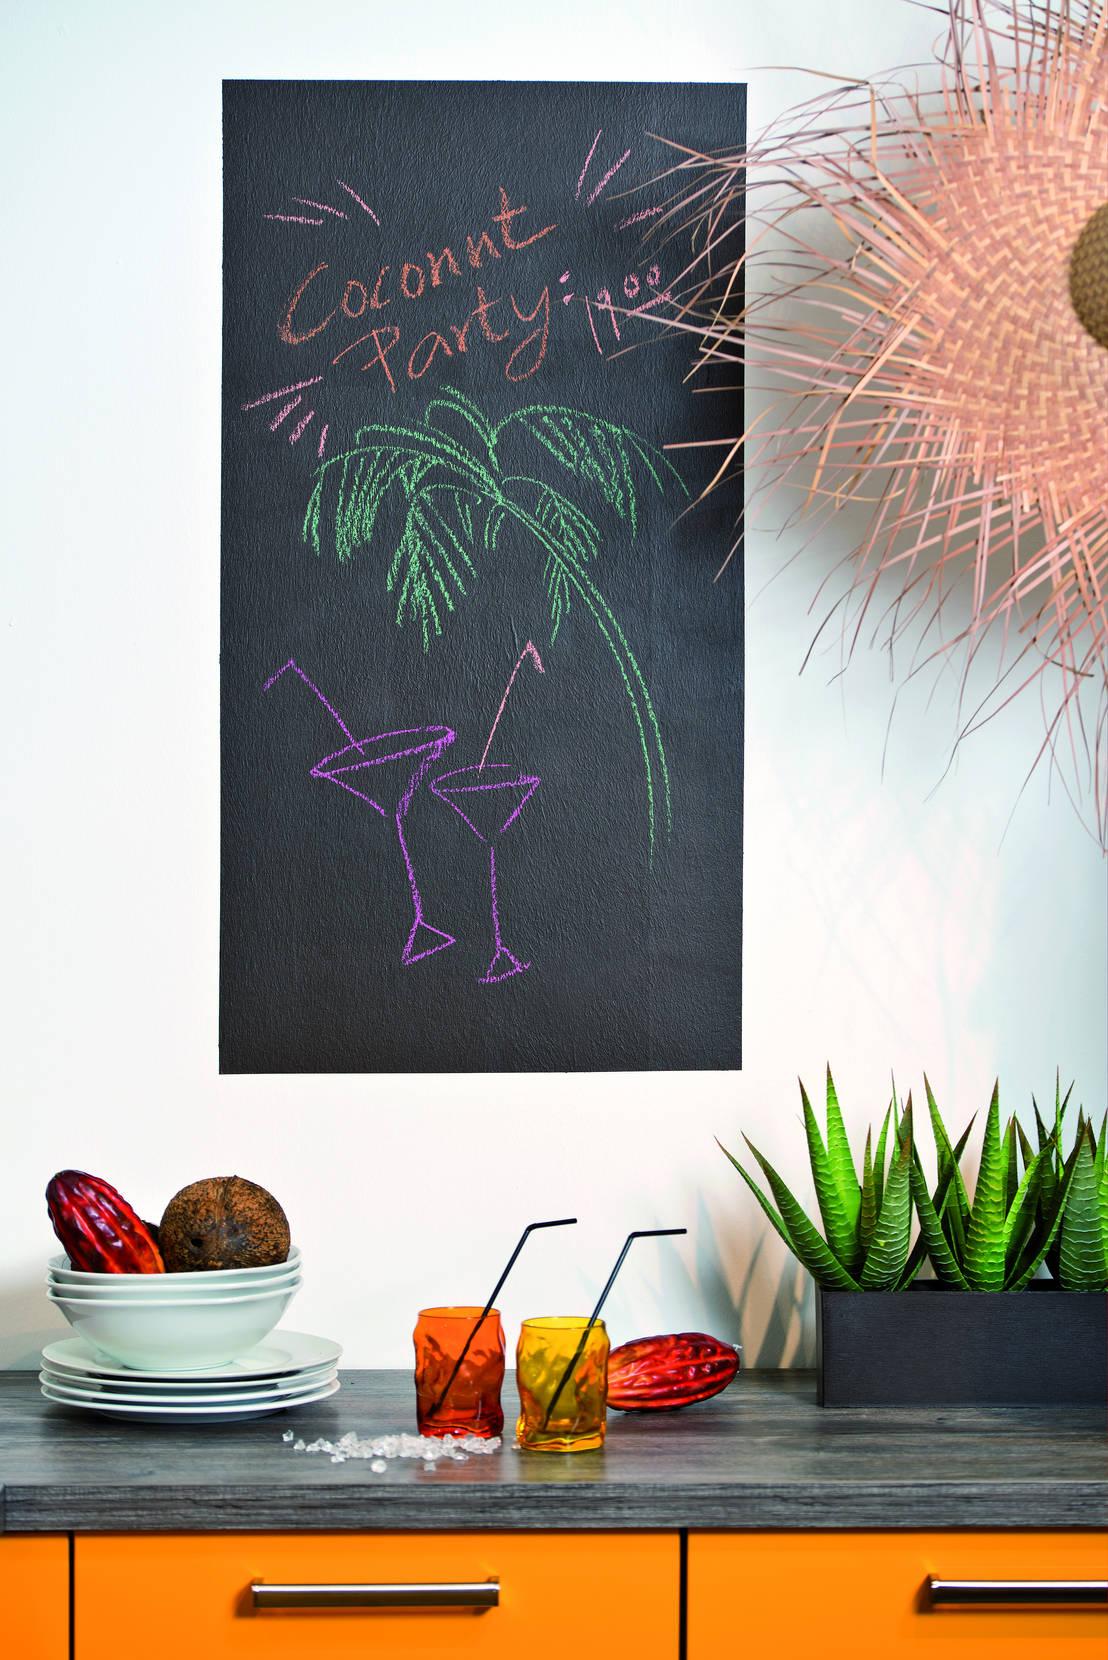 marabu colour your dreams tafel de marabu gmbh co kg homify. Black Bedroom Furniture Sets. Home Design Ideas